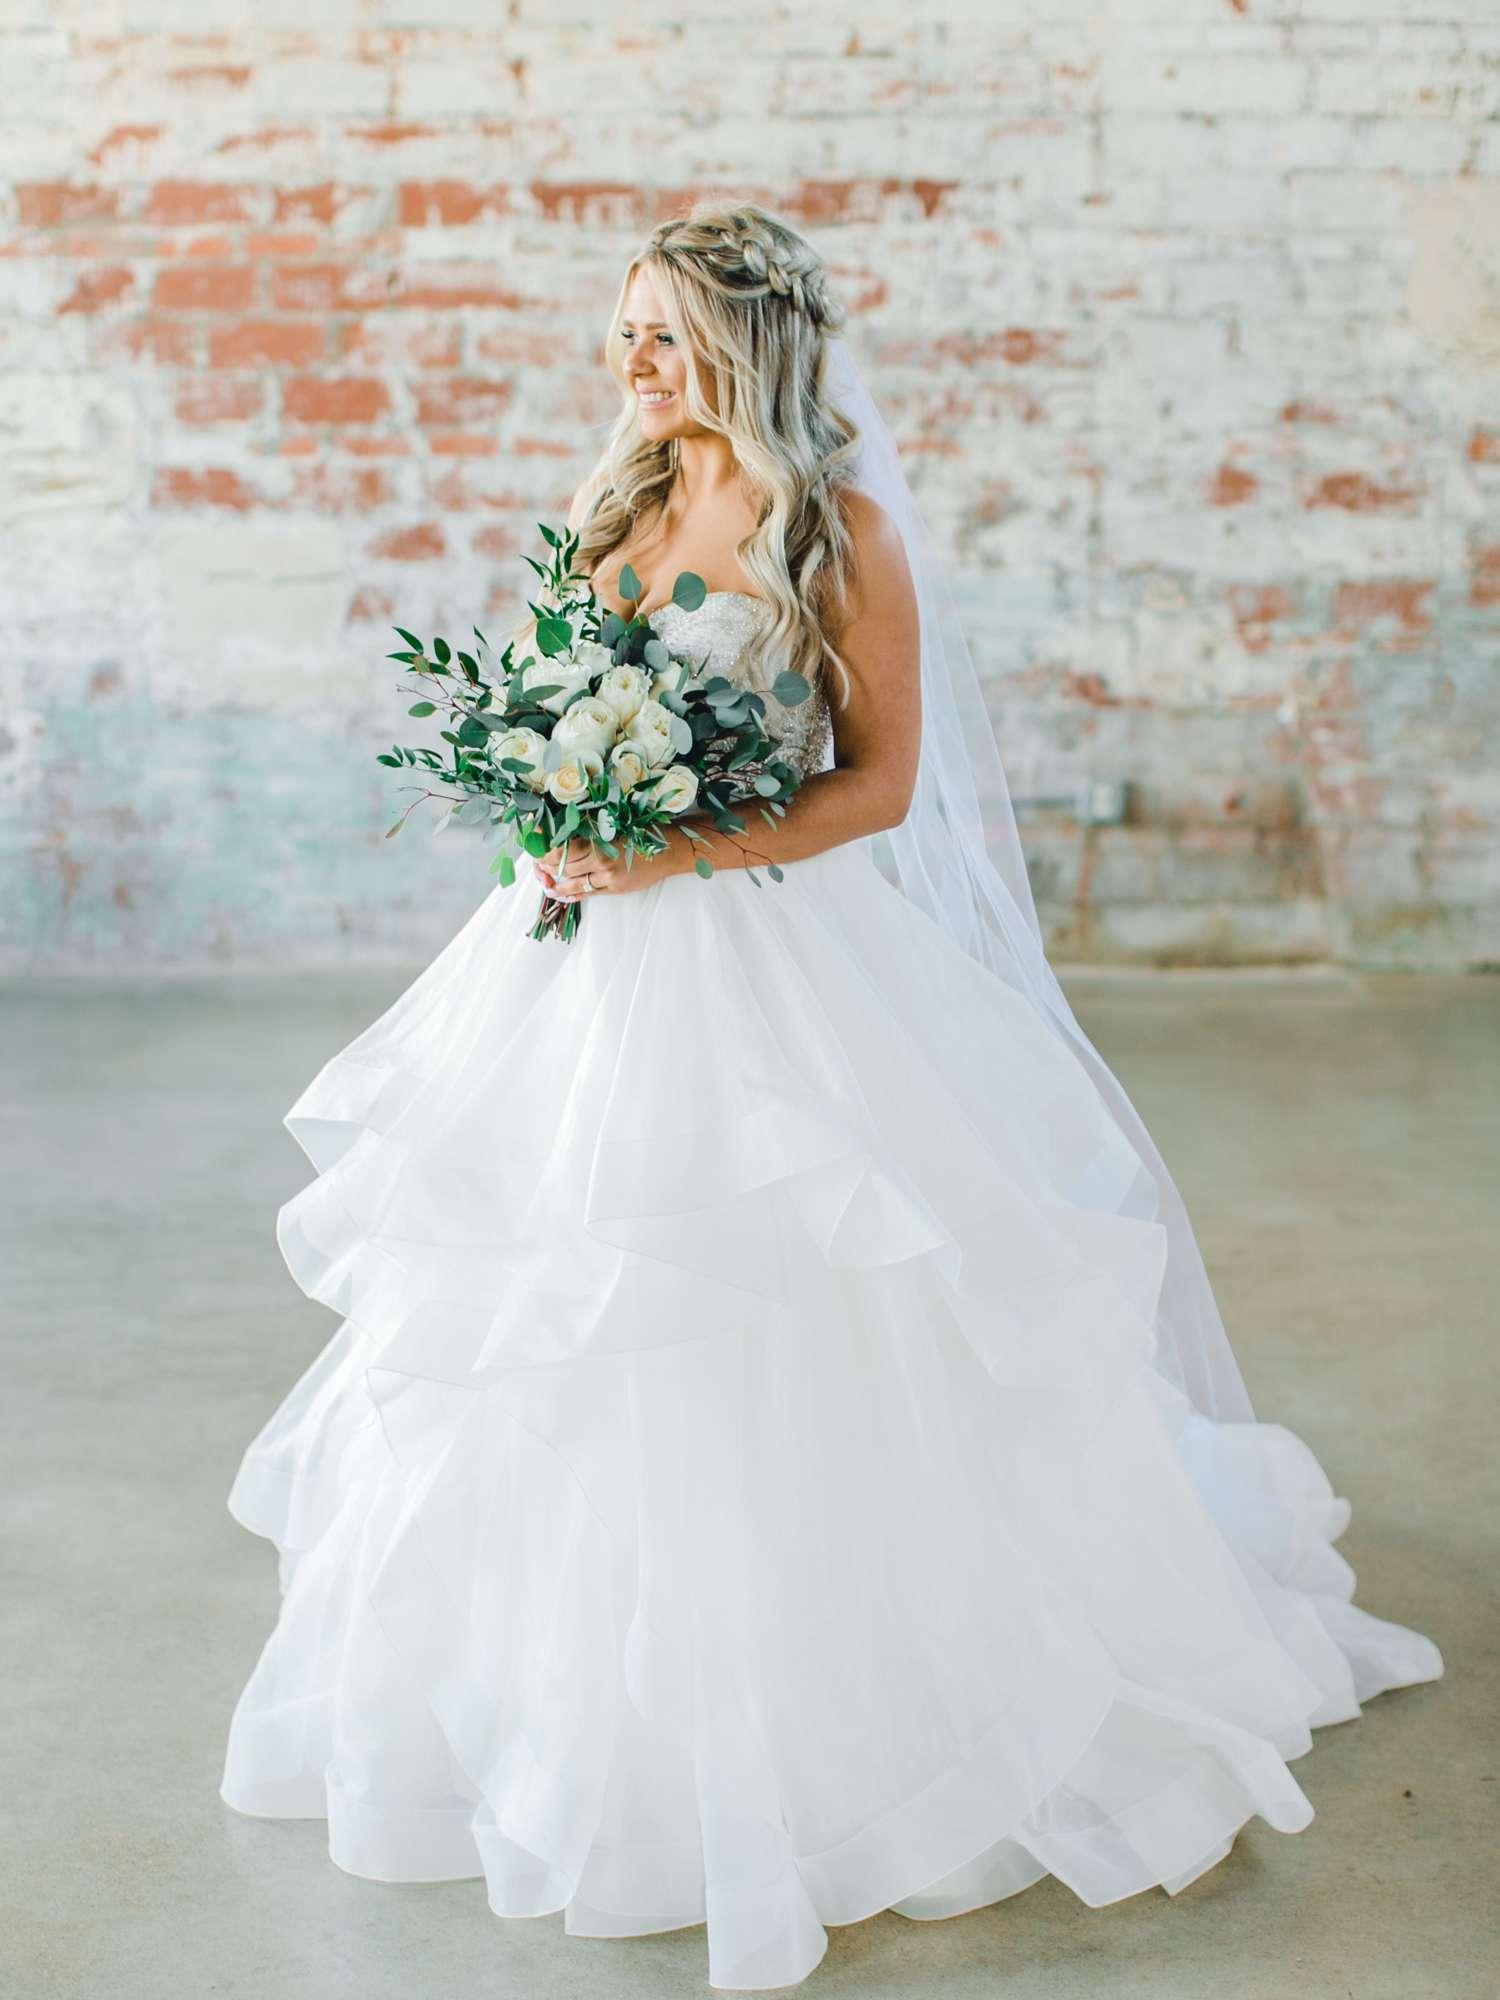 HAYLEE_DAVIS_ALLEEJ_LUBBOCK_WEDDING_PHOTOGRAPHER_BRIDALS_0005.jpg